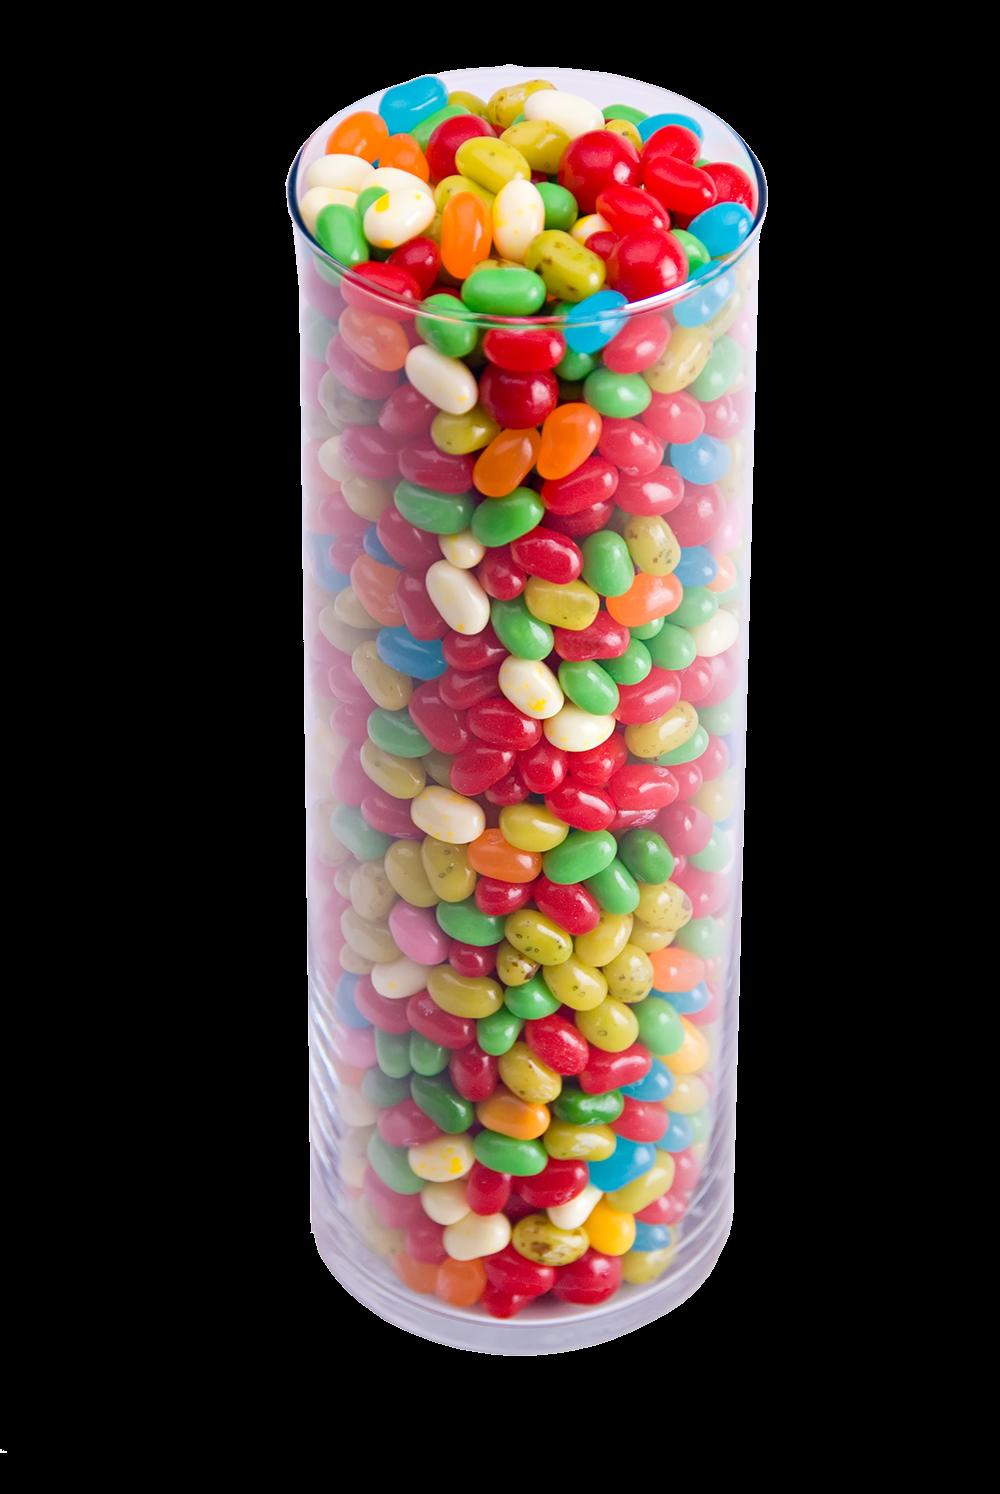 Jar clipart sprinkle. Jelly belly